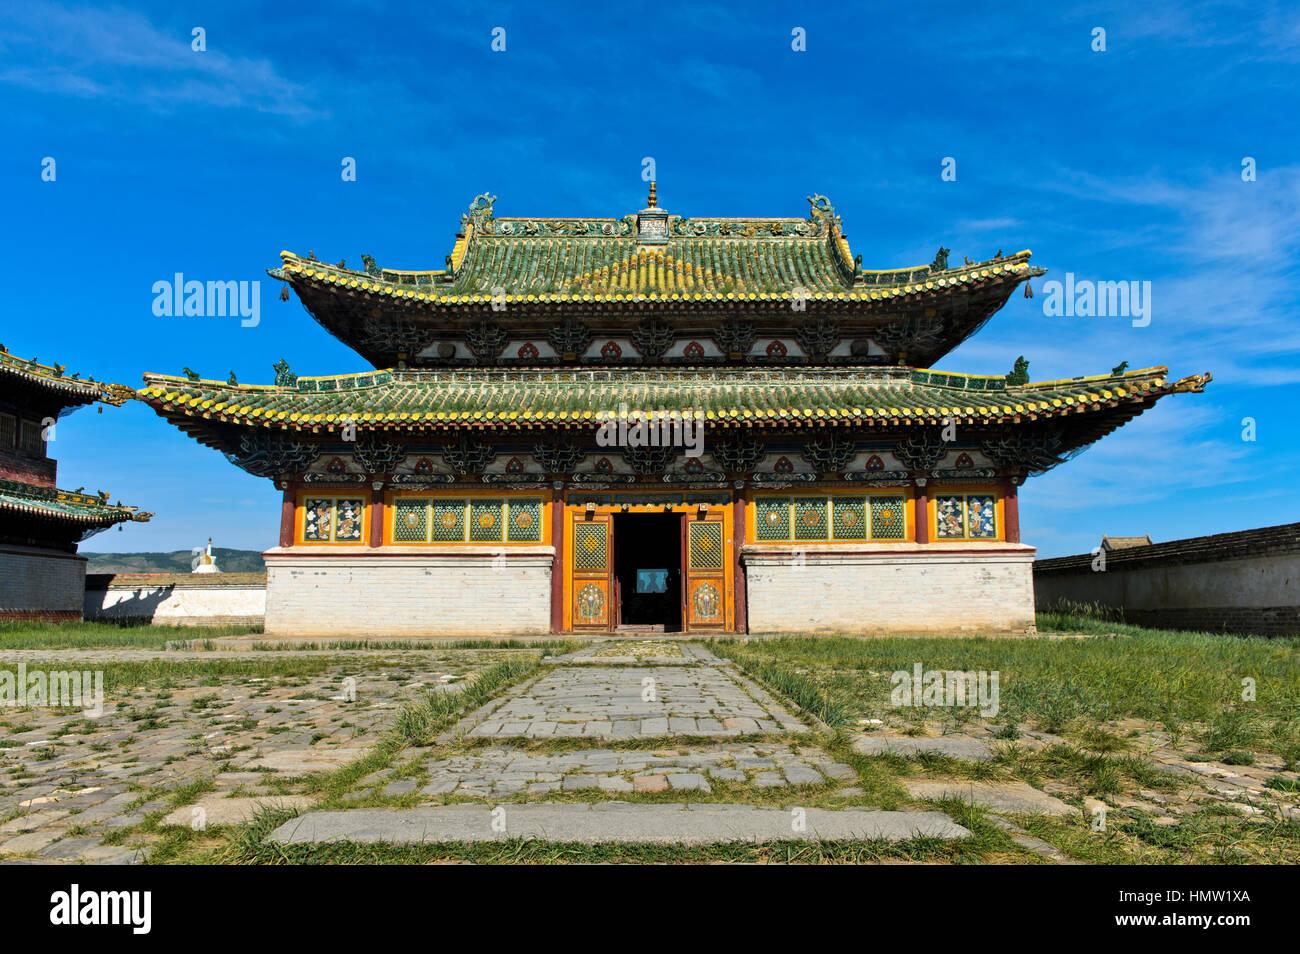 Eastern Zuu temple, Erdene Zuu monastery, Kharkhorin, Övörkhangai Aimag, Mongolia - Stock Image